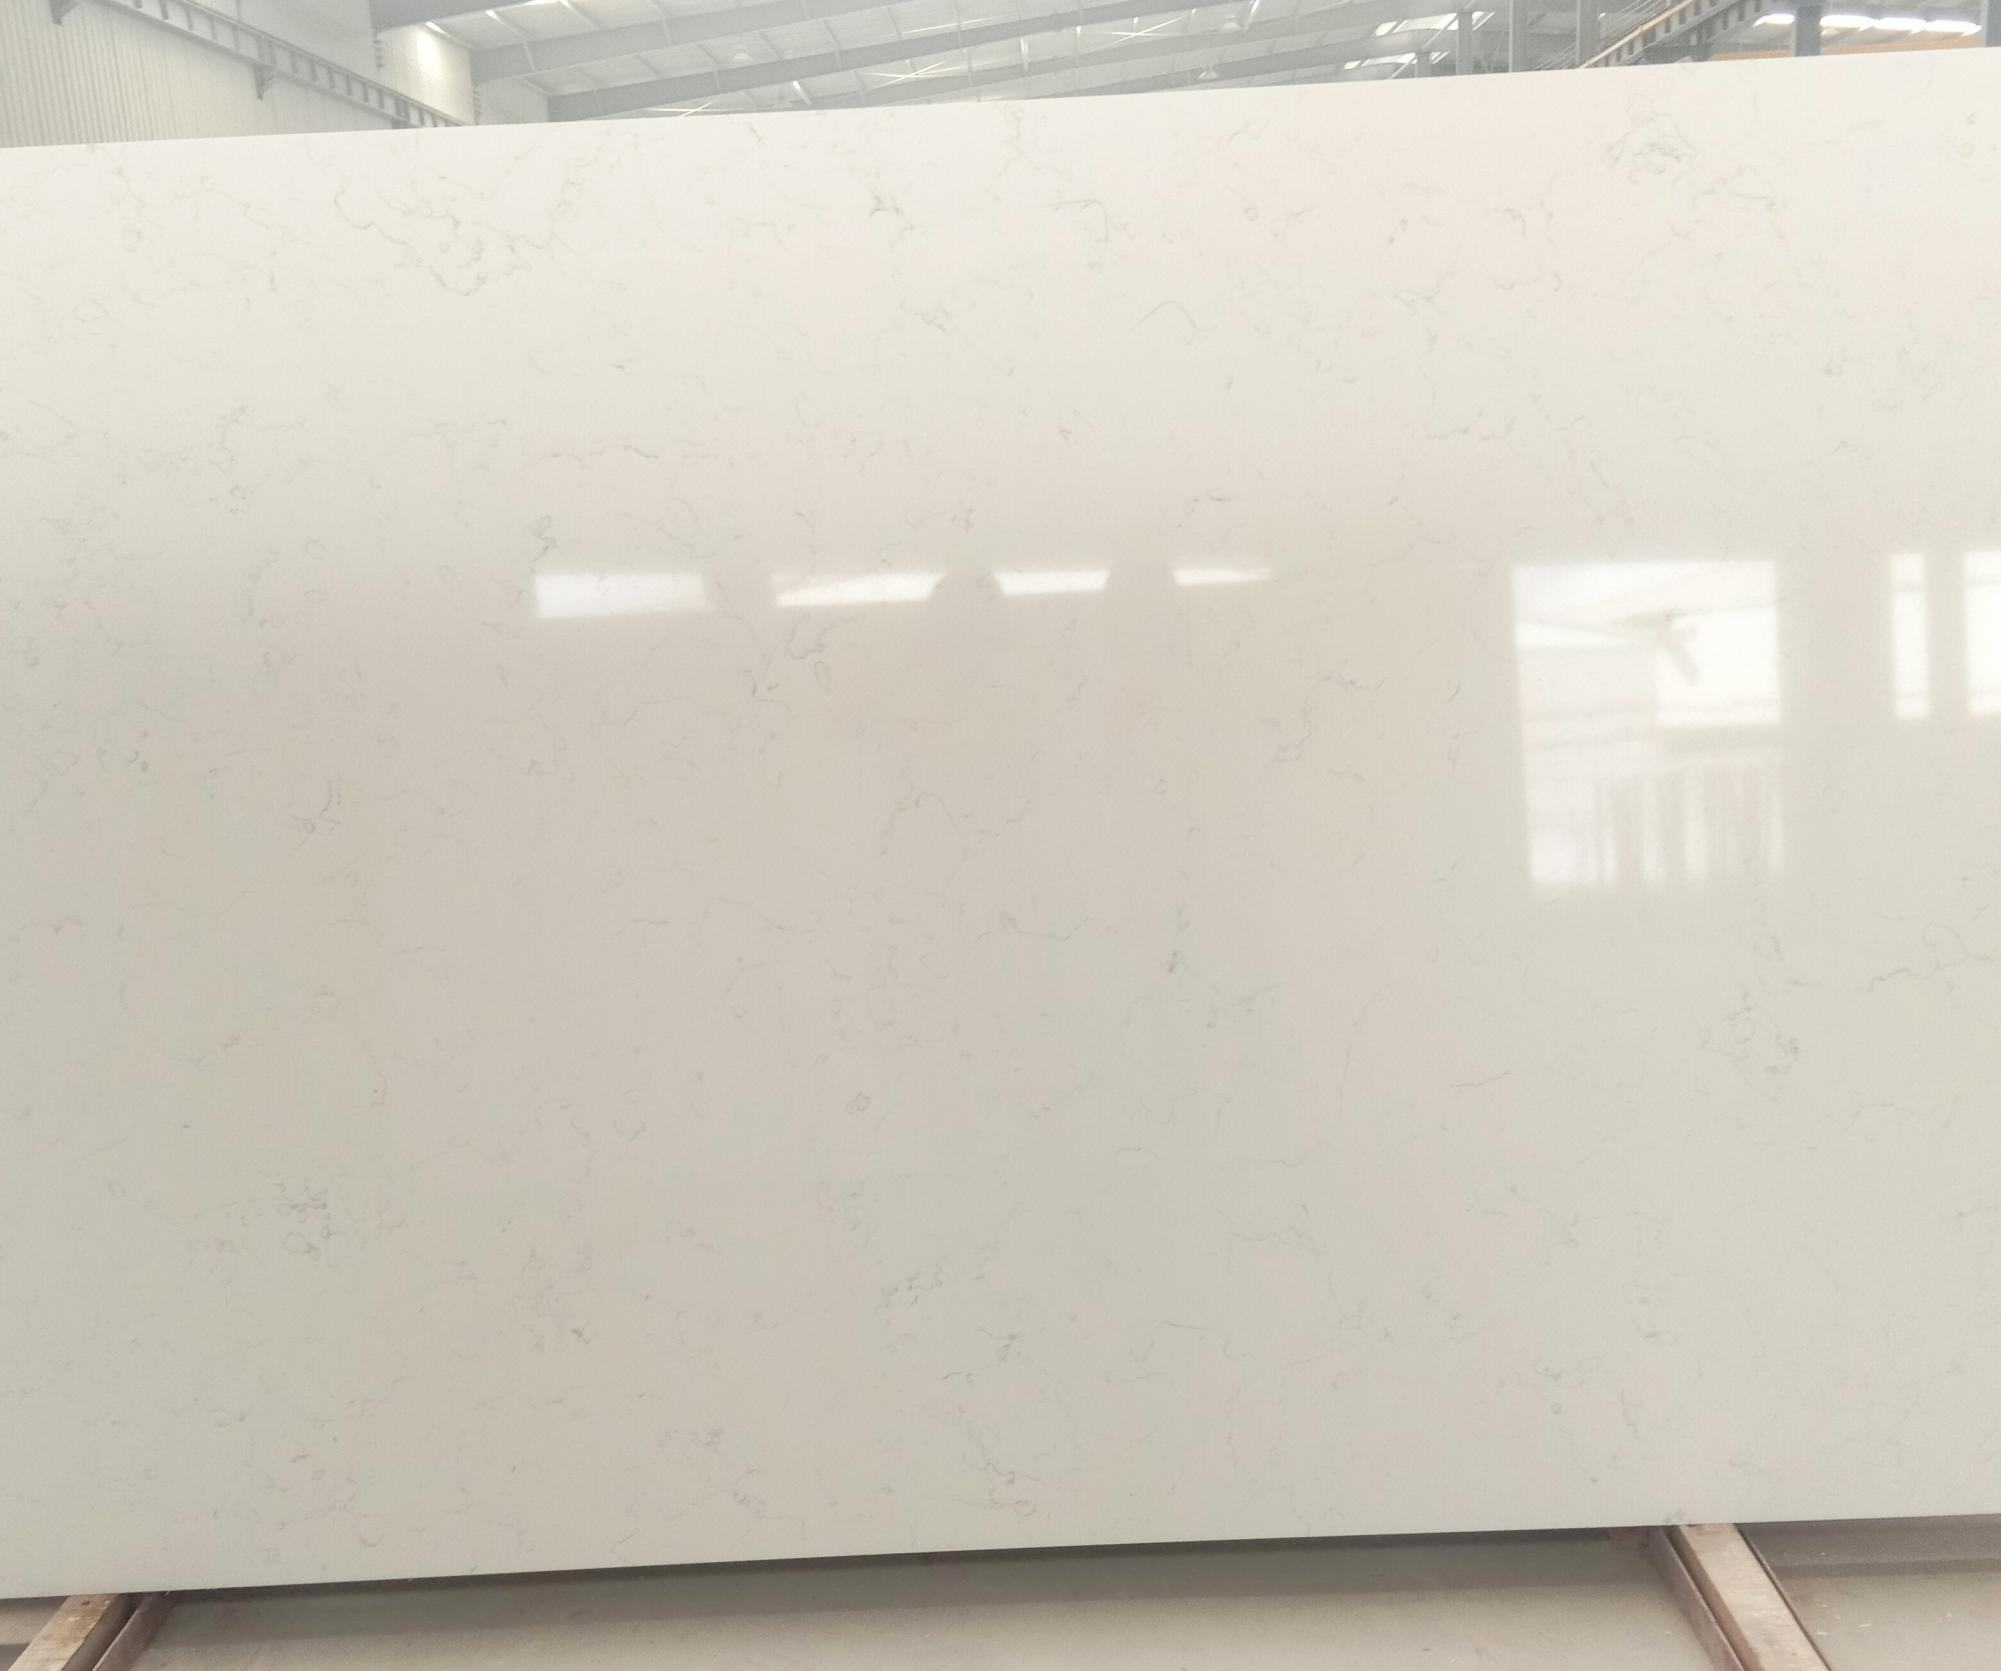 Venetian White Suministro Hai Phong (Vietnam) de planchas pulidas en cuarzo aglomerado artificial 6302 , SL3CM